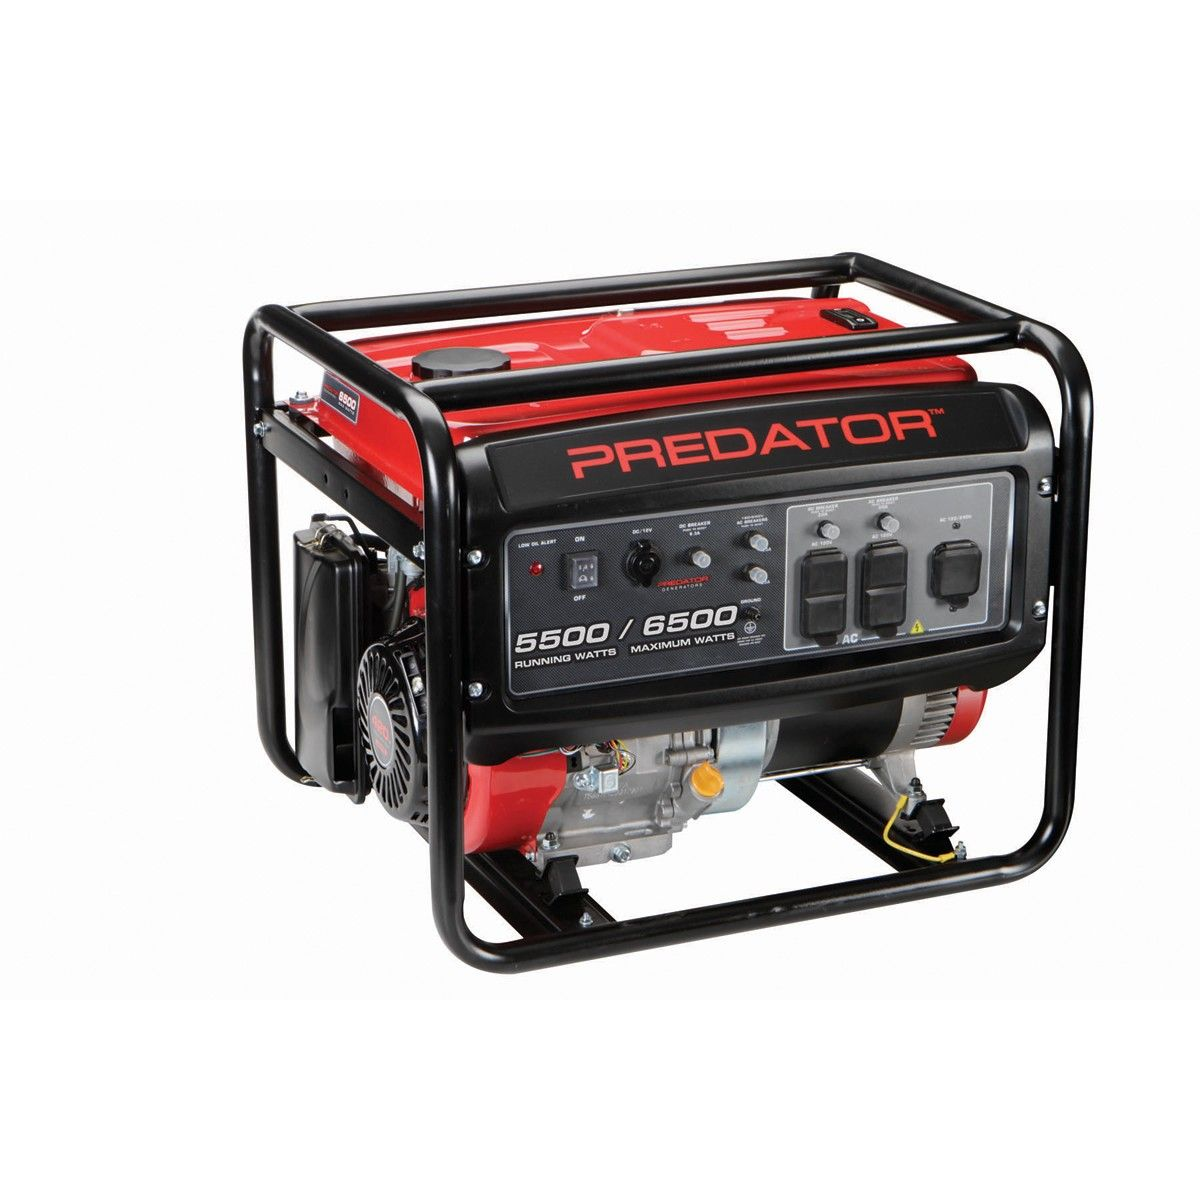 hight resolution of predator generators 68529 420cc 6500 watts max 5500 watts rated portable generator